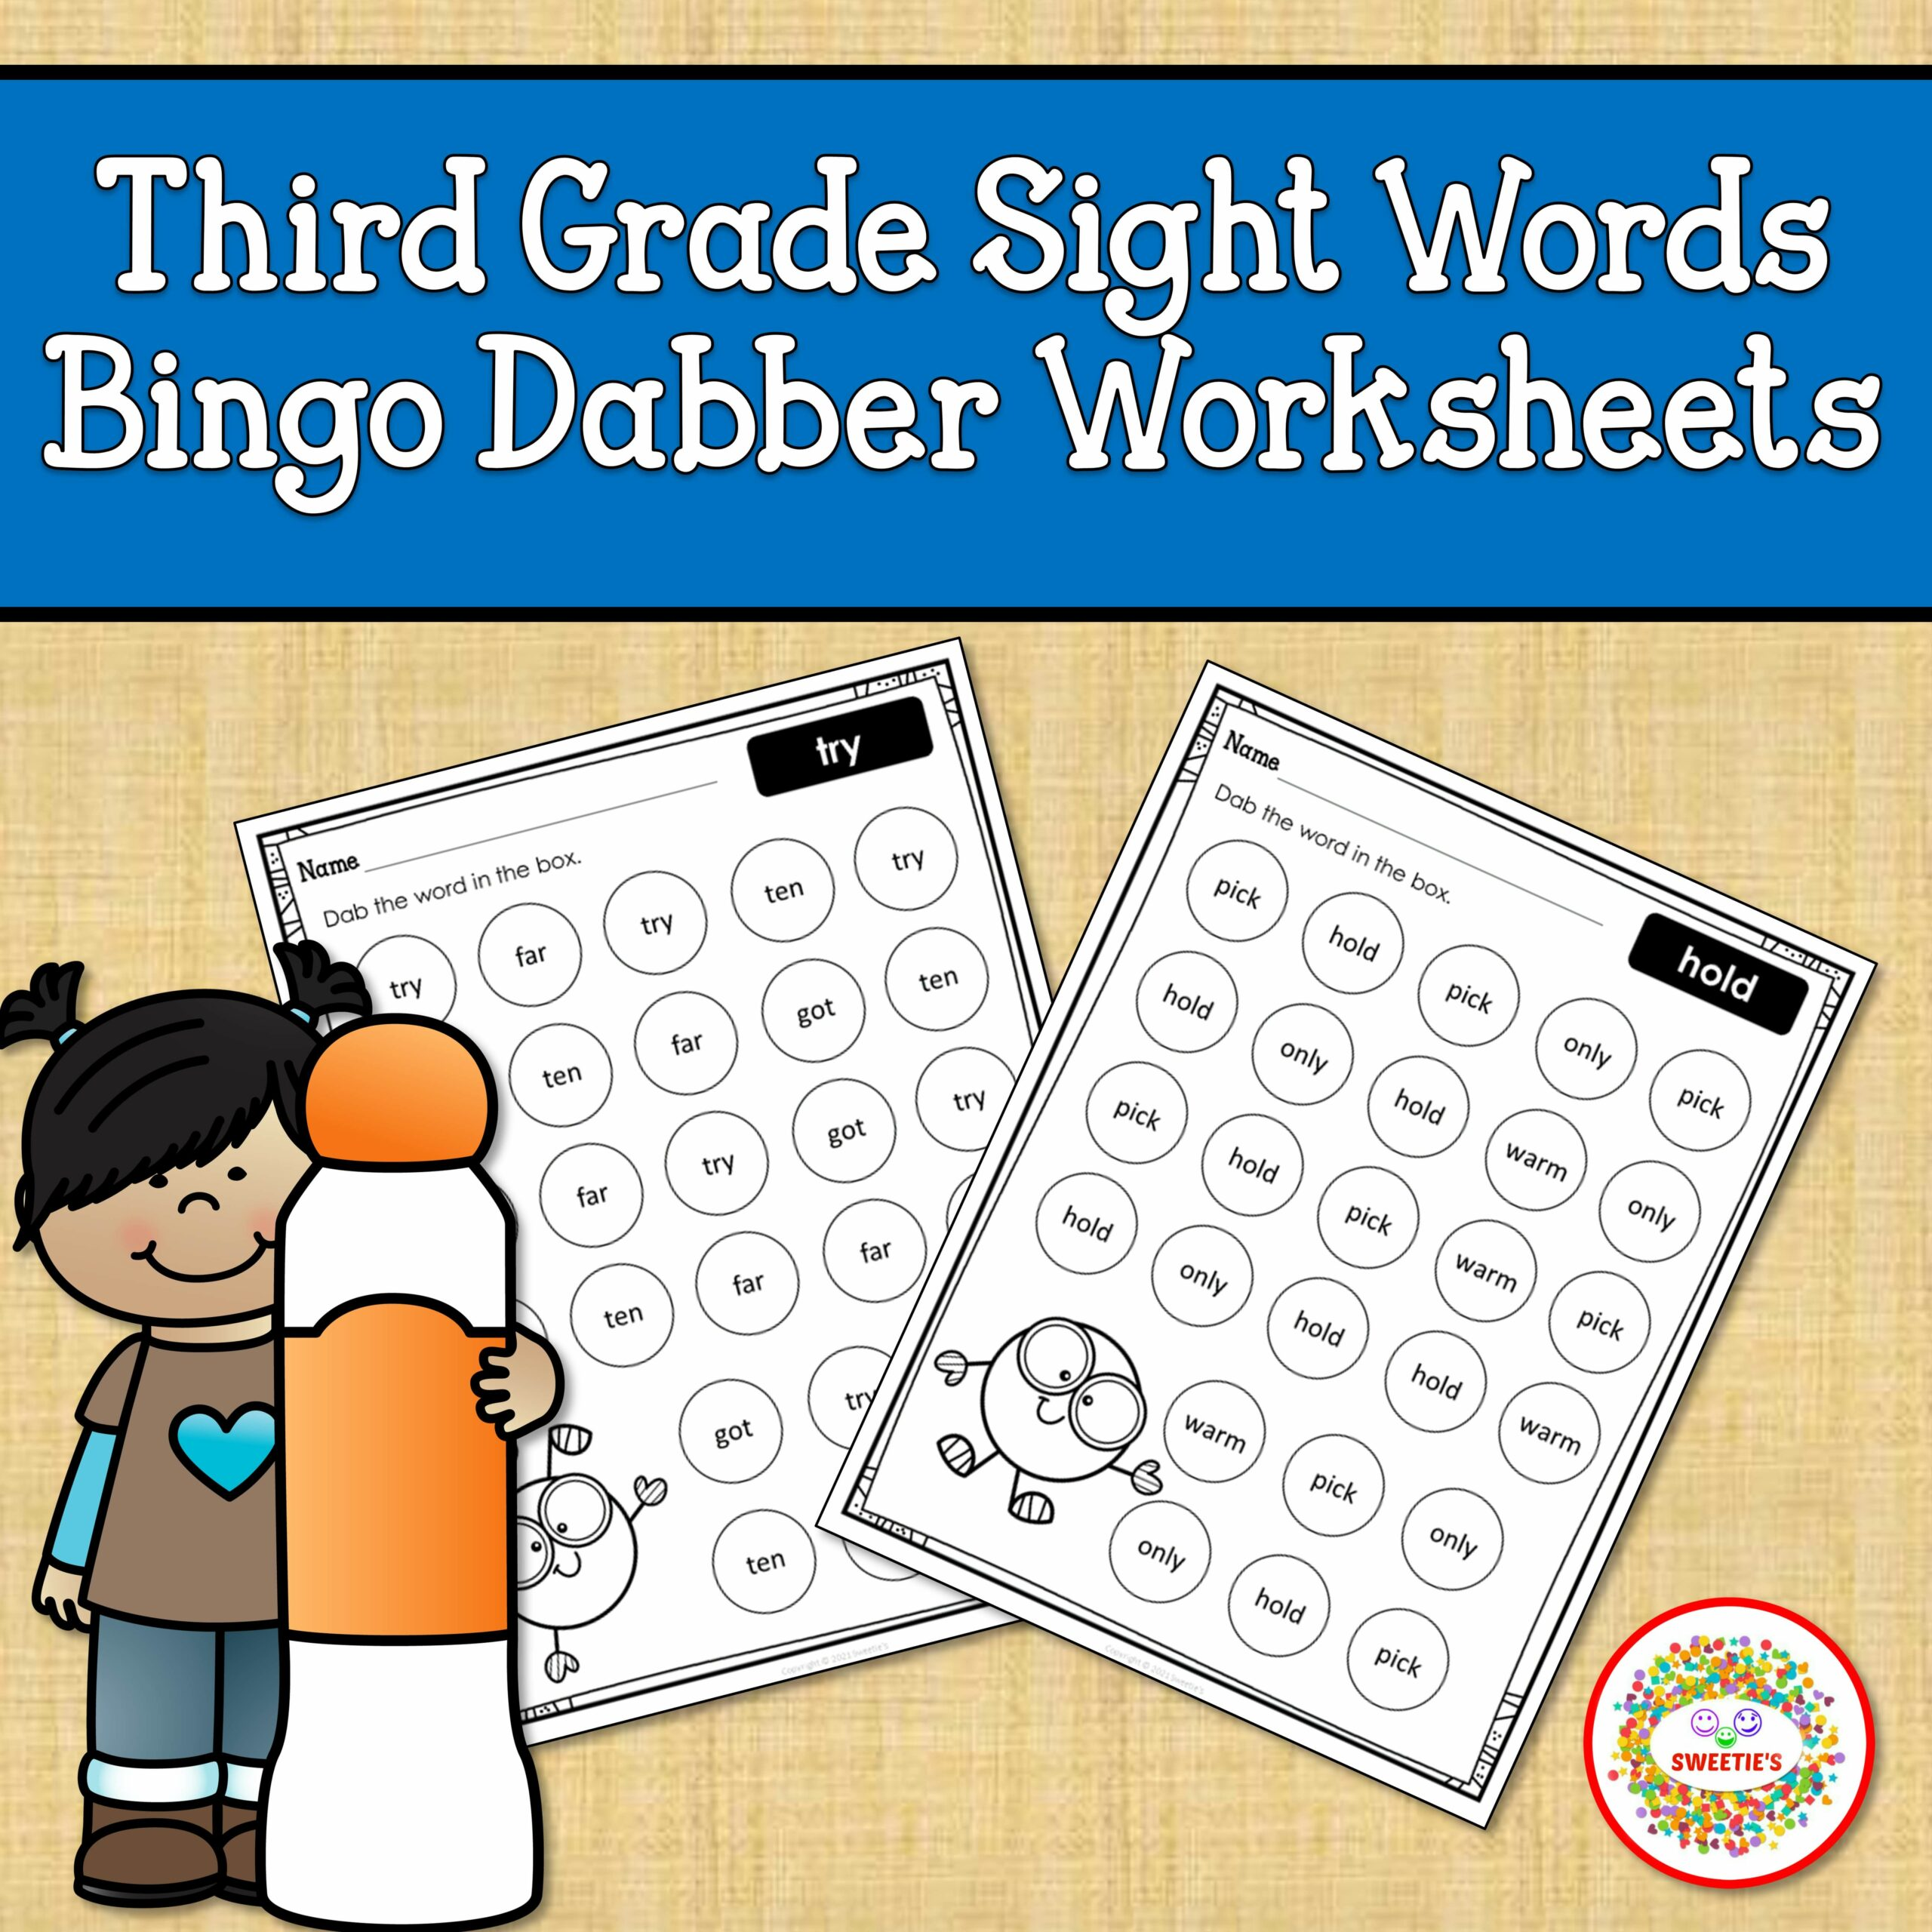 Third Grade Sight Word Bingo Dabber Worksheets